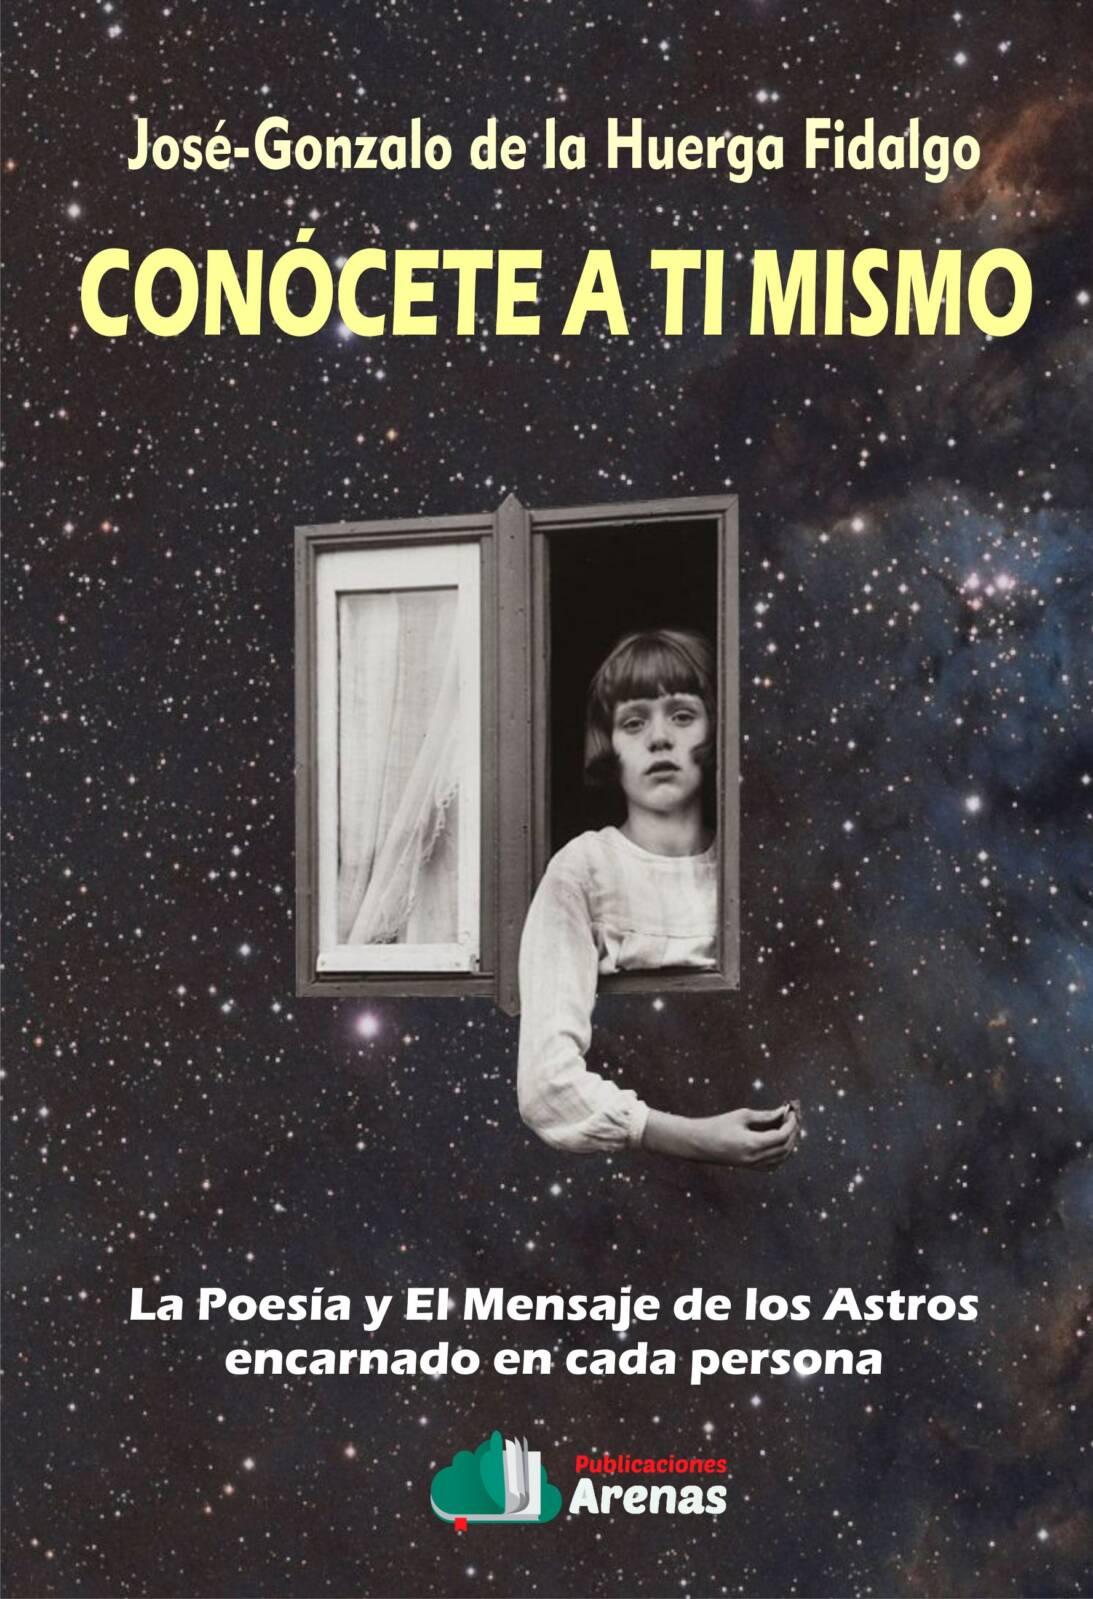 PORTADA-CONOCETE-3-e1618180550330.jpg